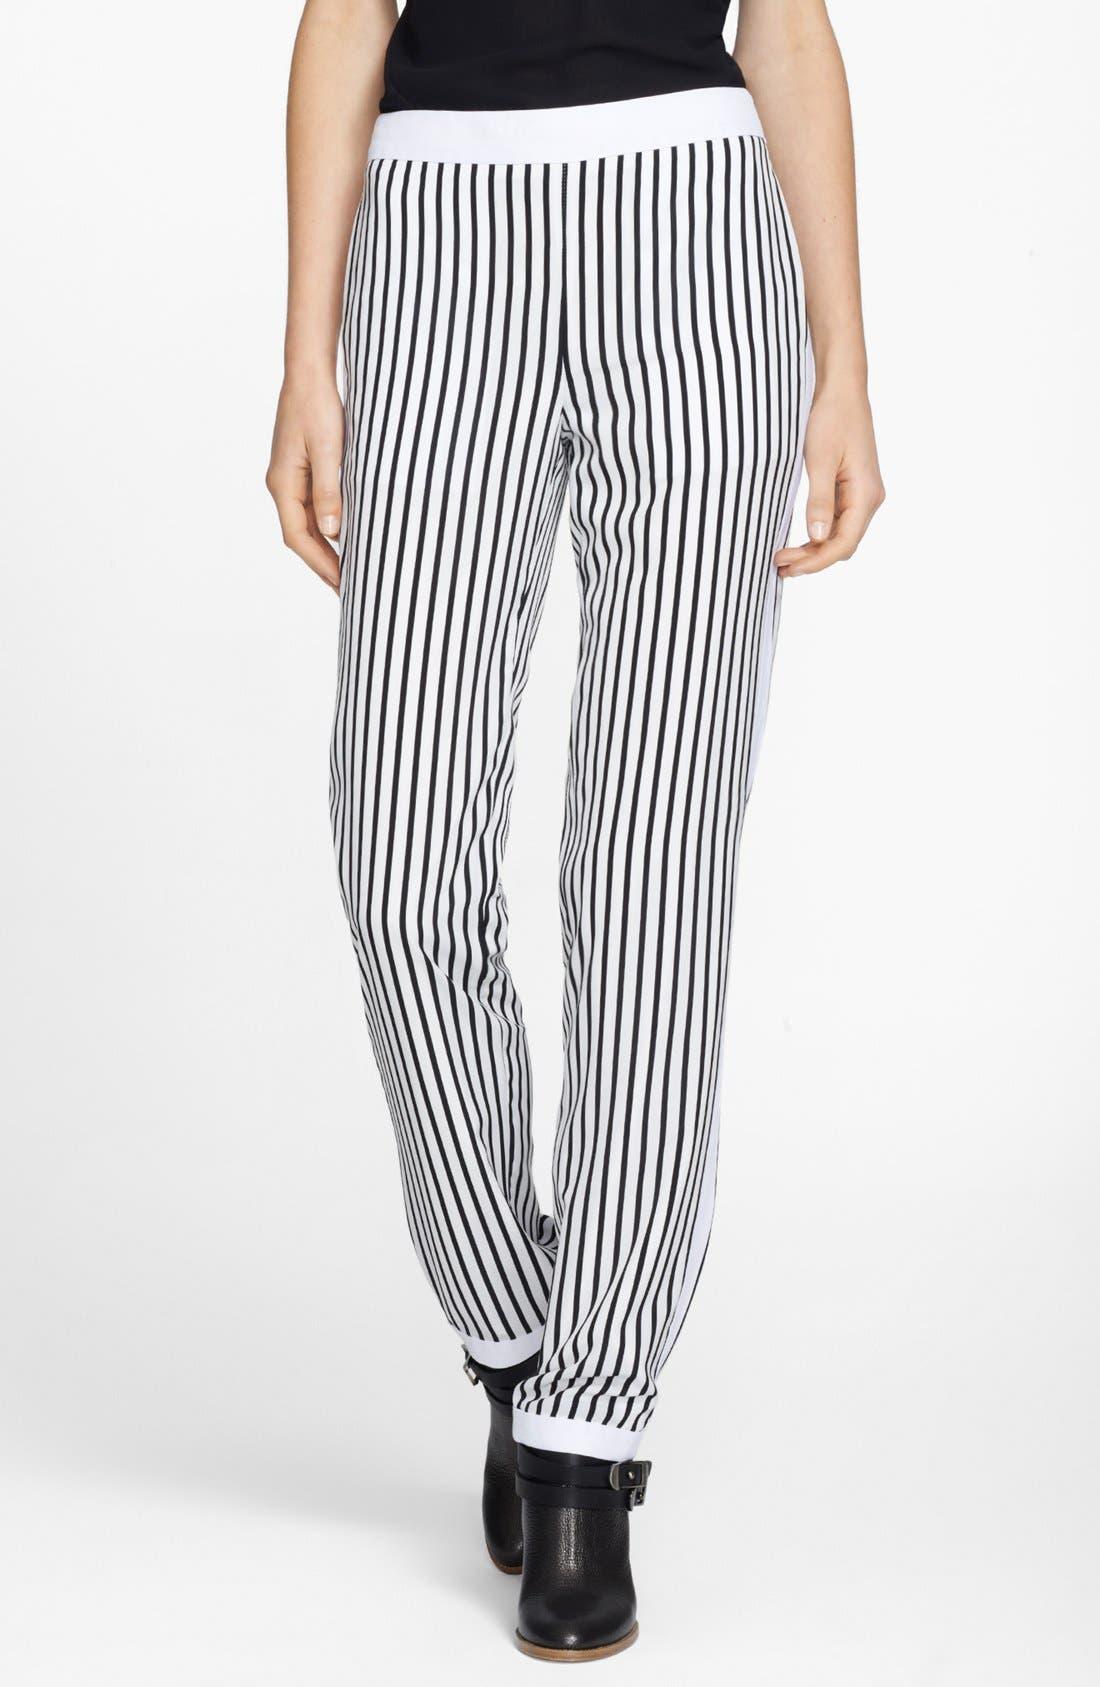 Alternate Image 1 Selected - J Brand Ready-To-Wear 'Delia' Stripe Trousers